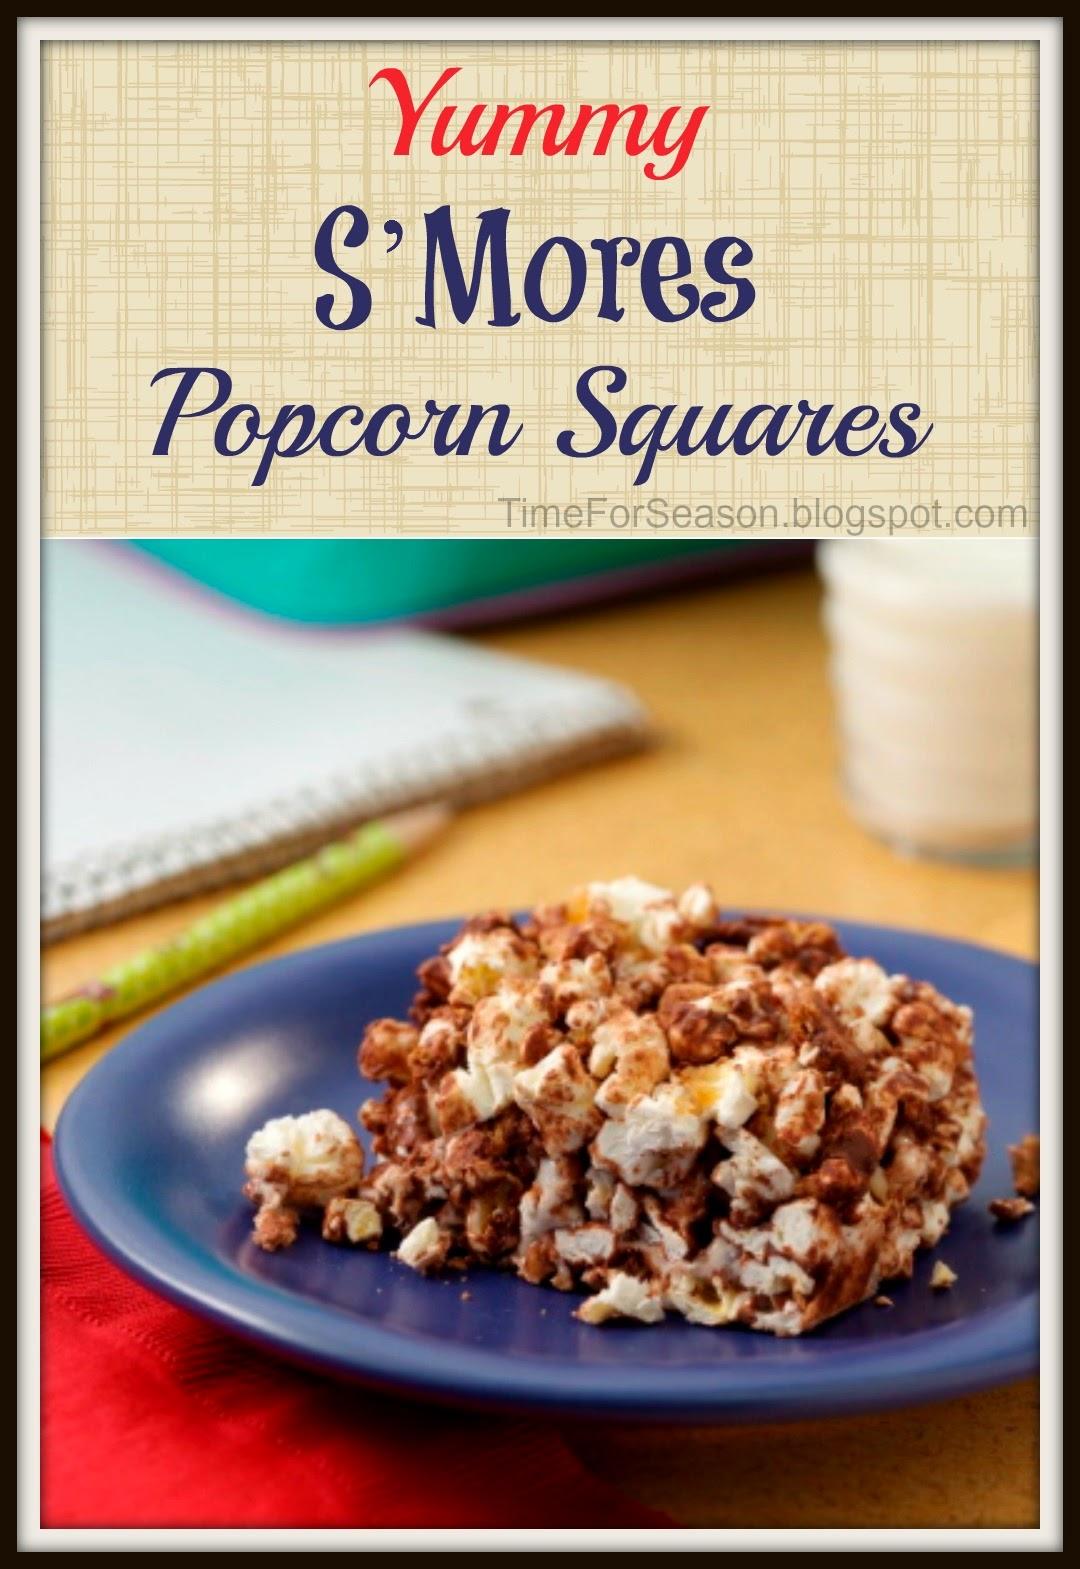 http://timeforseason.blogspot.com/2014/05/smores-popcorn-squares-recipe.html